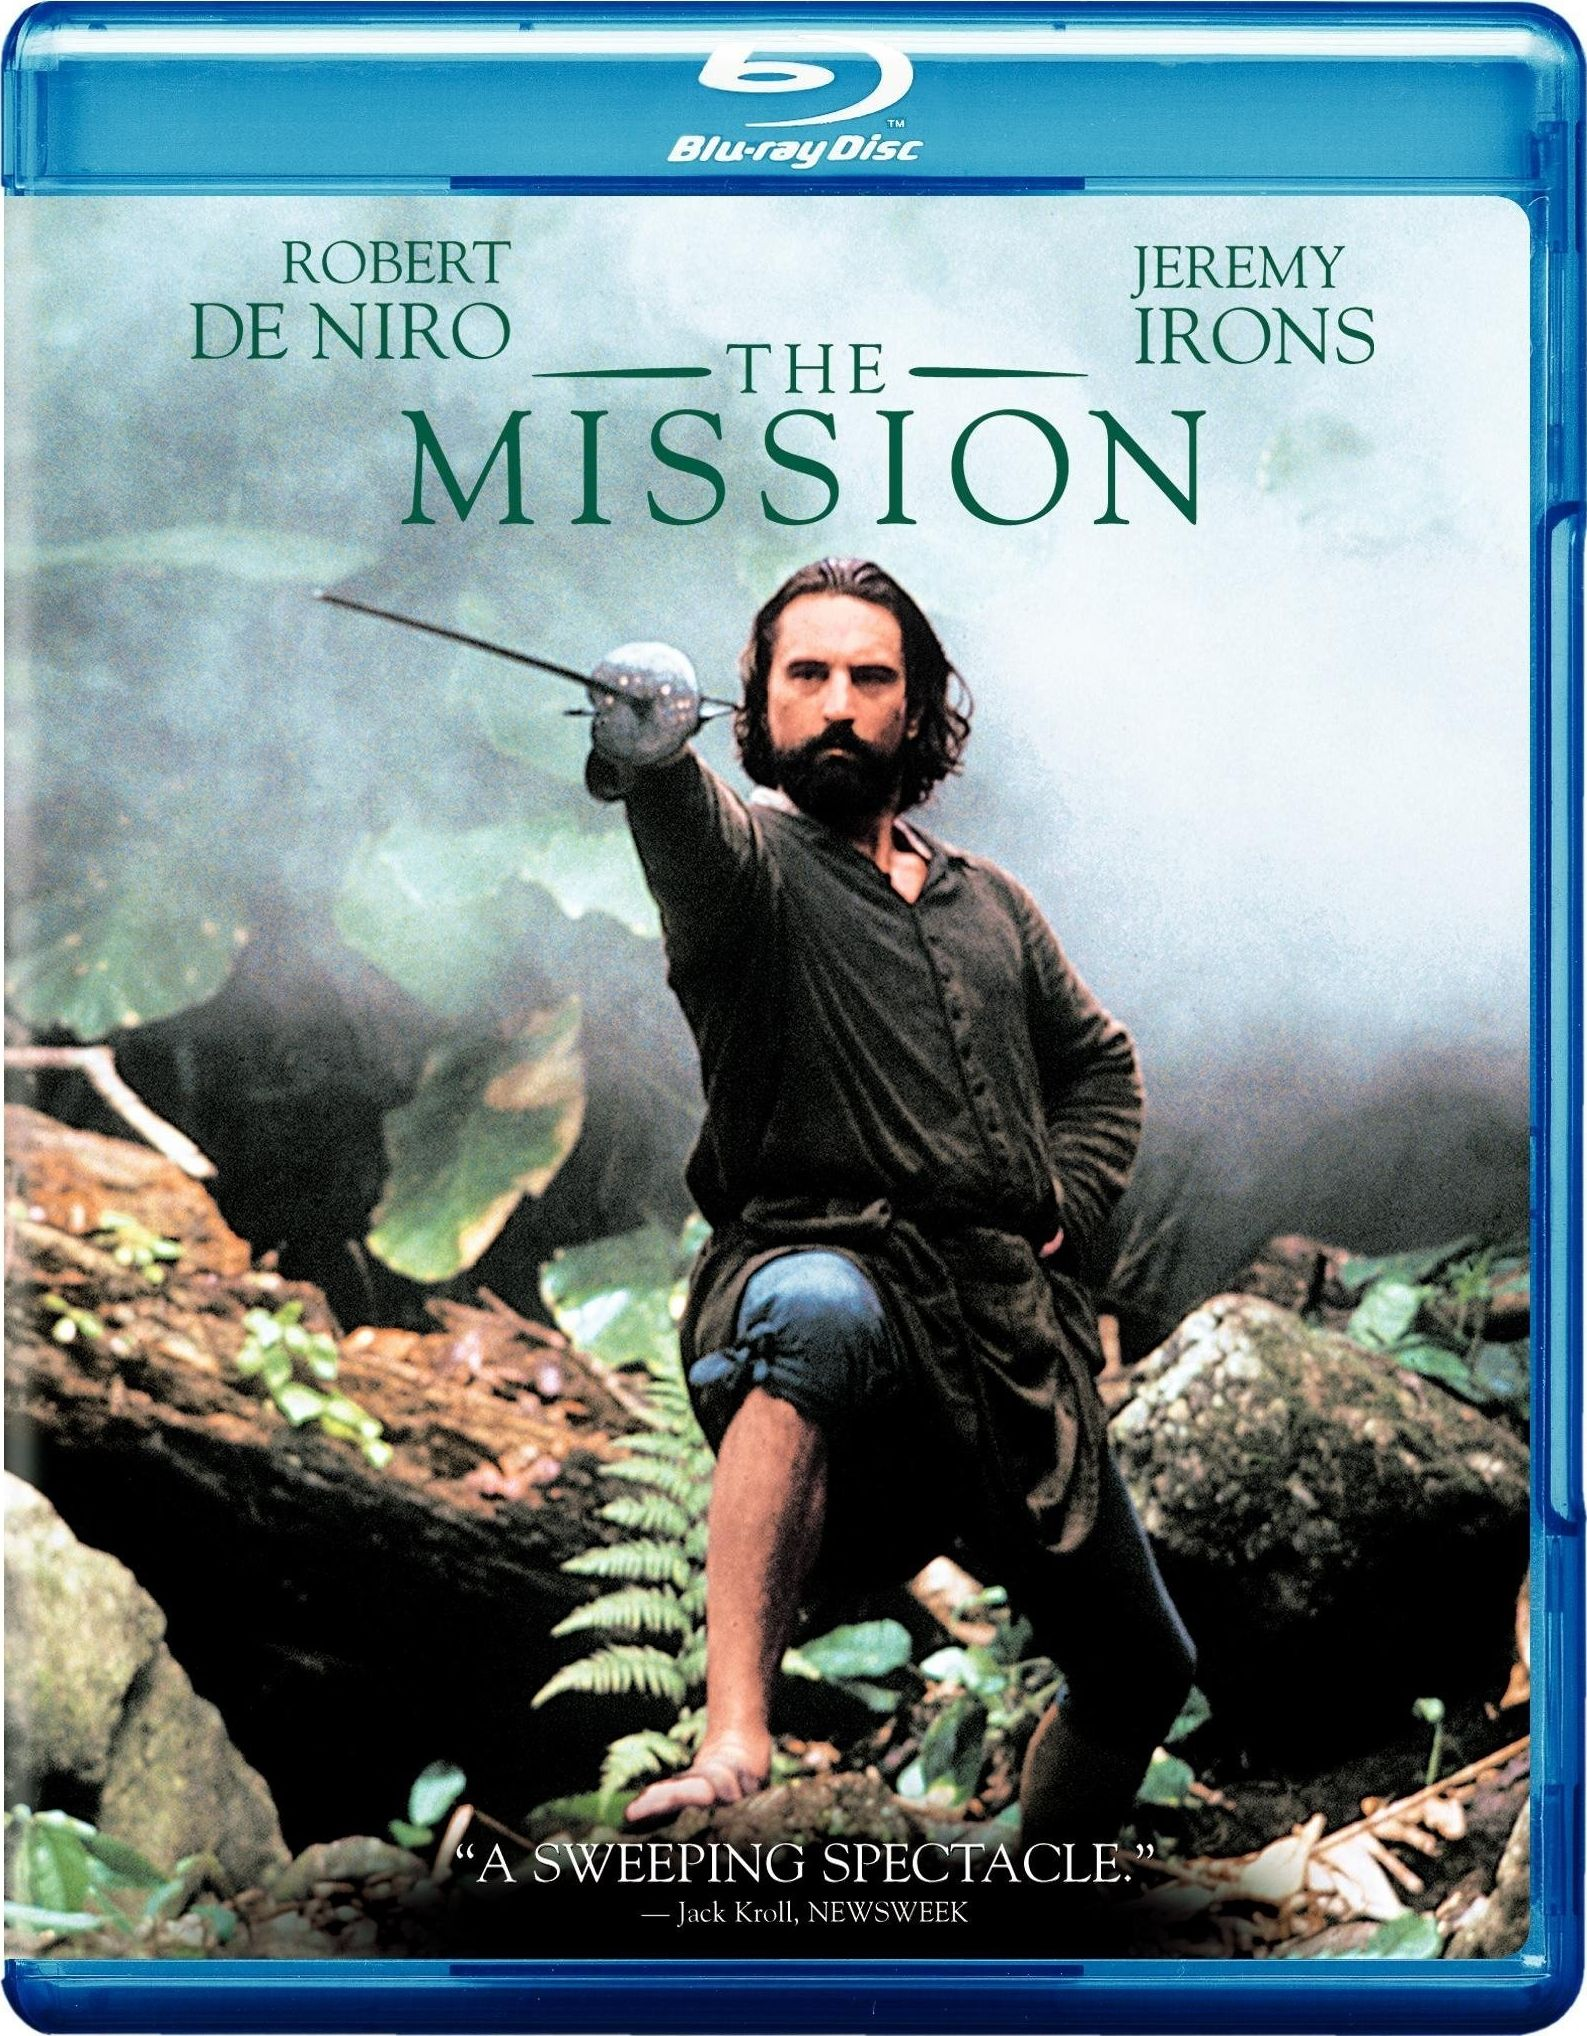 The Mission Christian Movie/Film DVD Bluray, Robert De